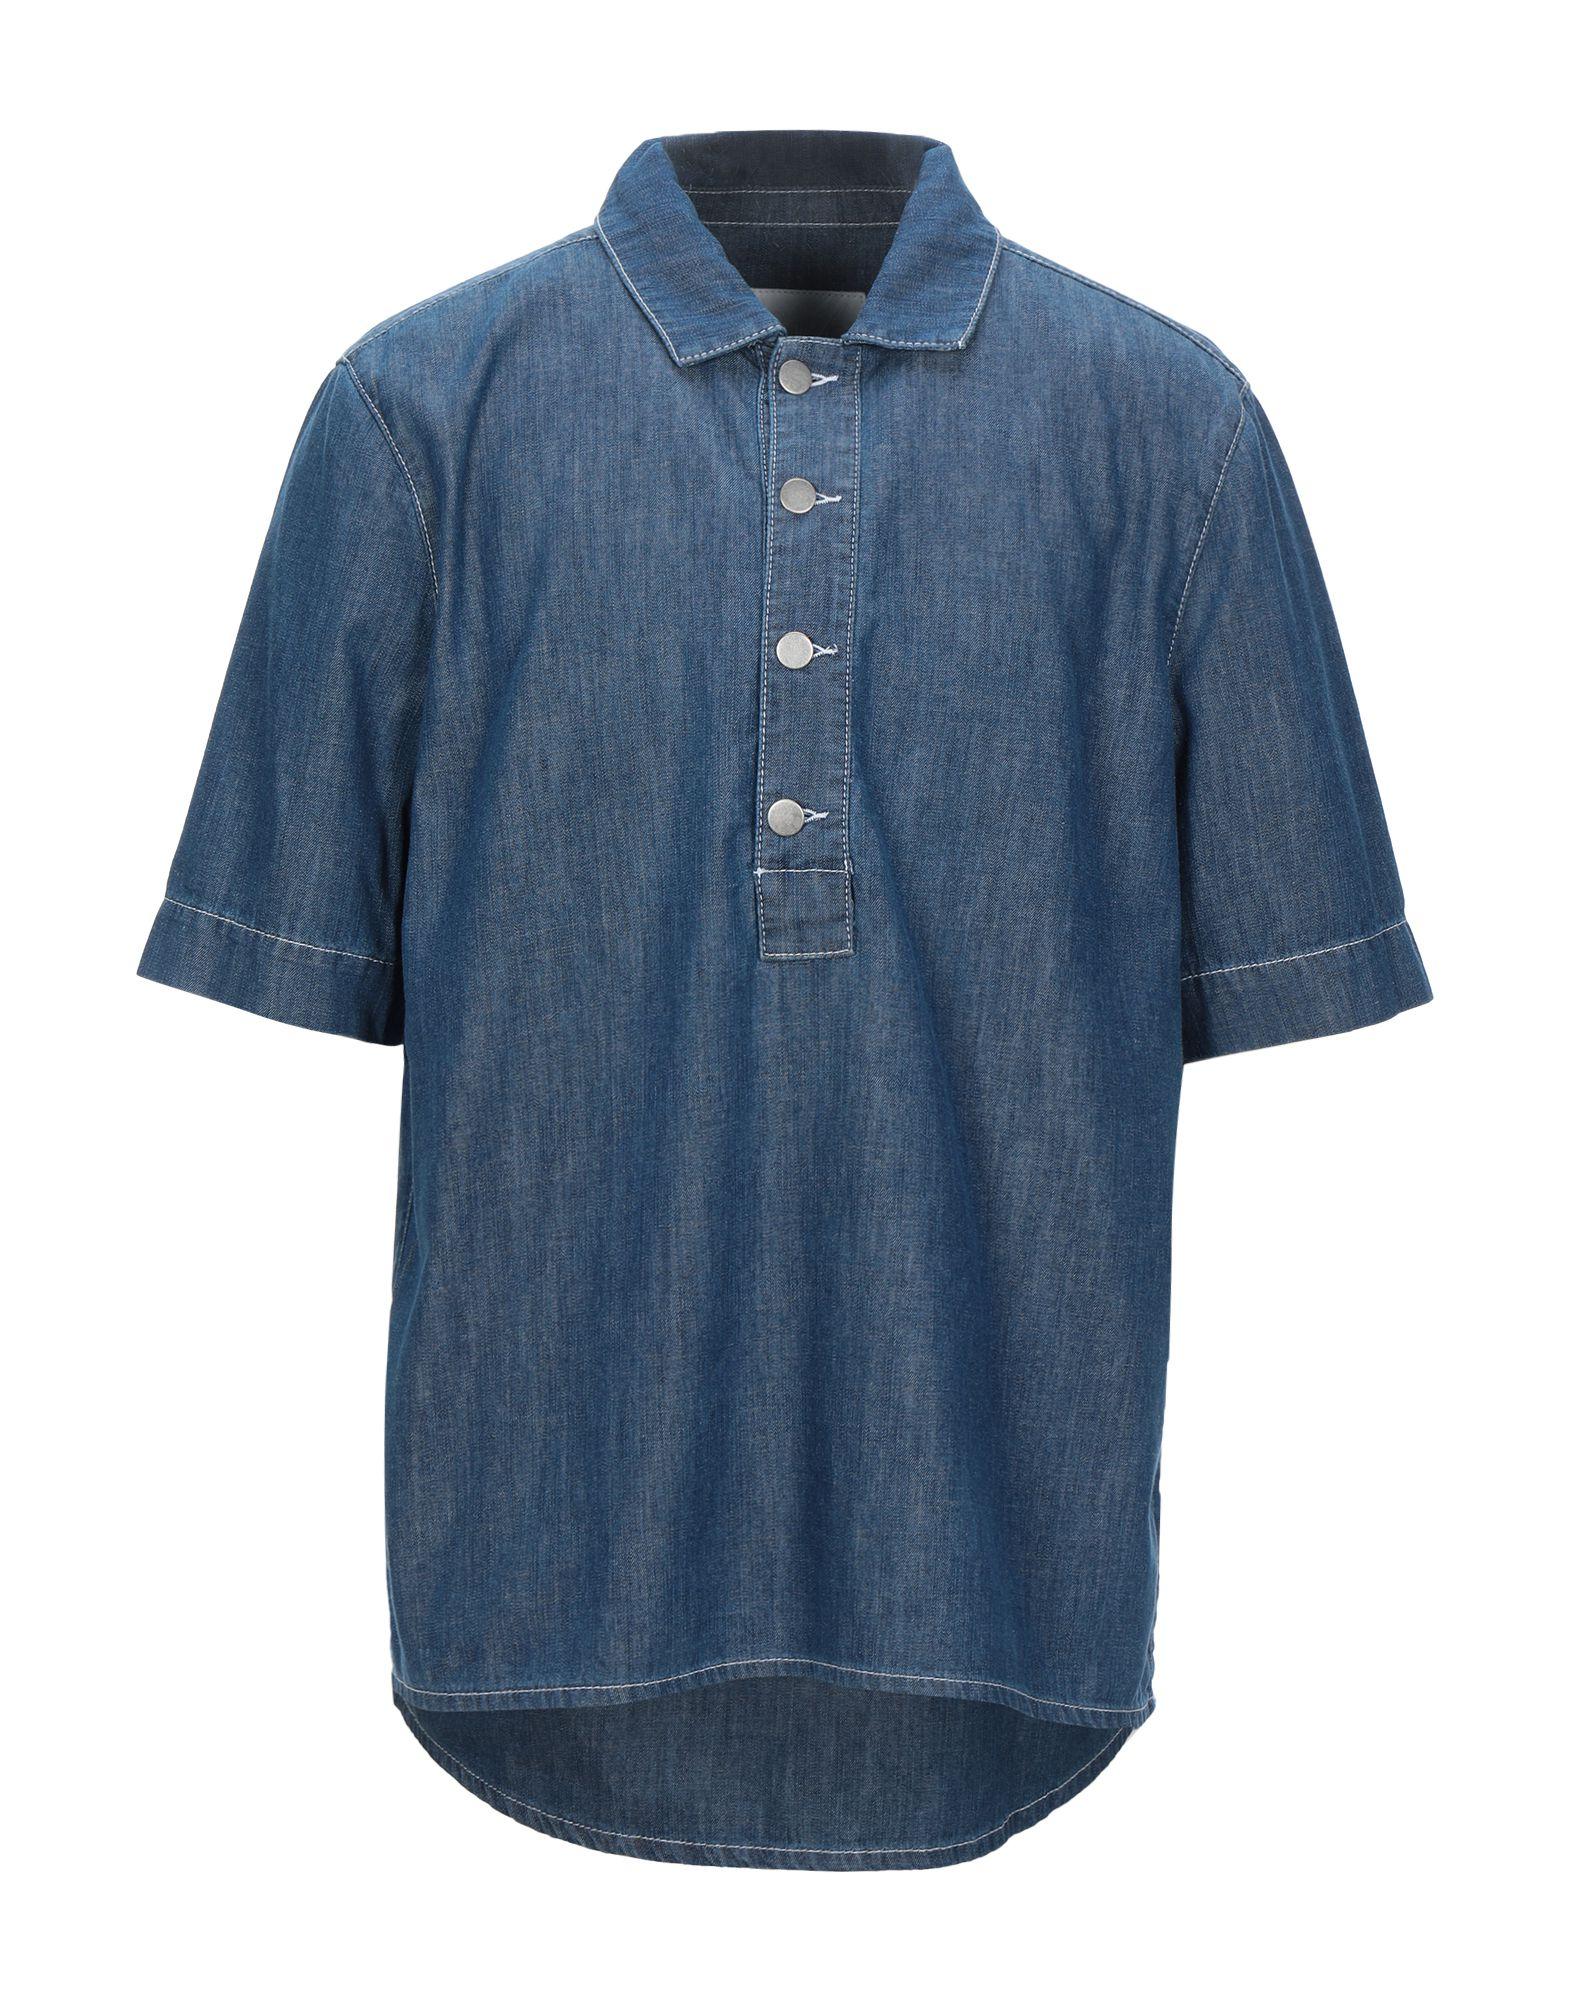 Фото - HOLZWEILER Джинсовая рубашка holzweiler